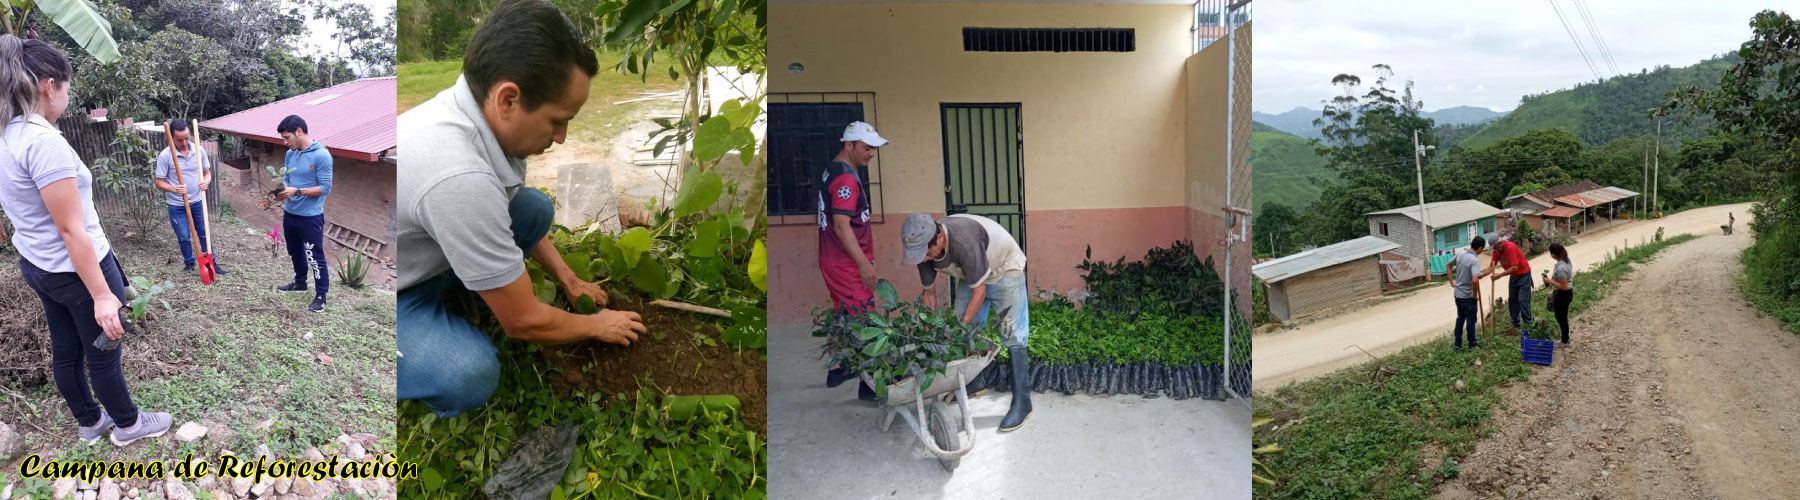 campaa-de-reforestacin.jpg